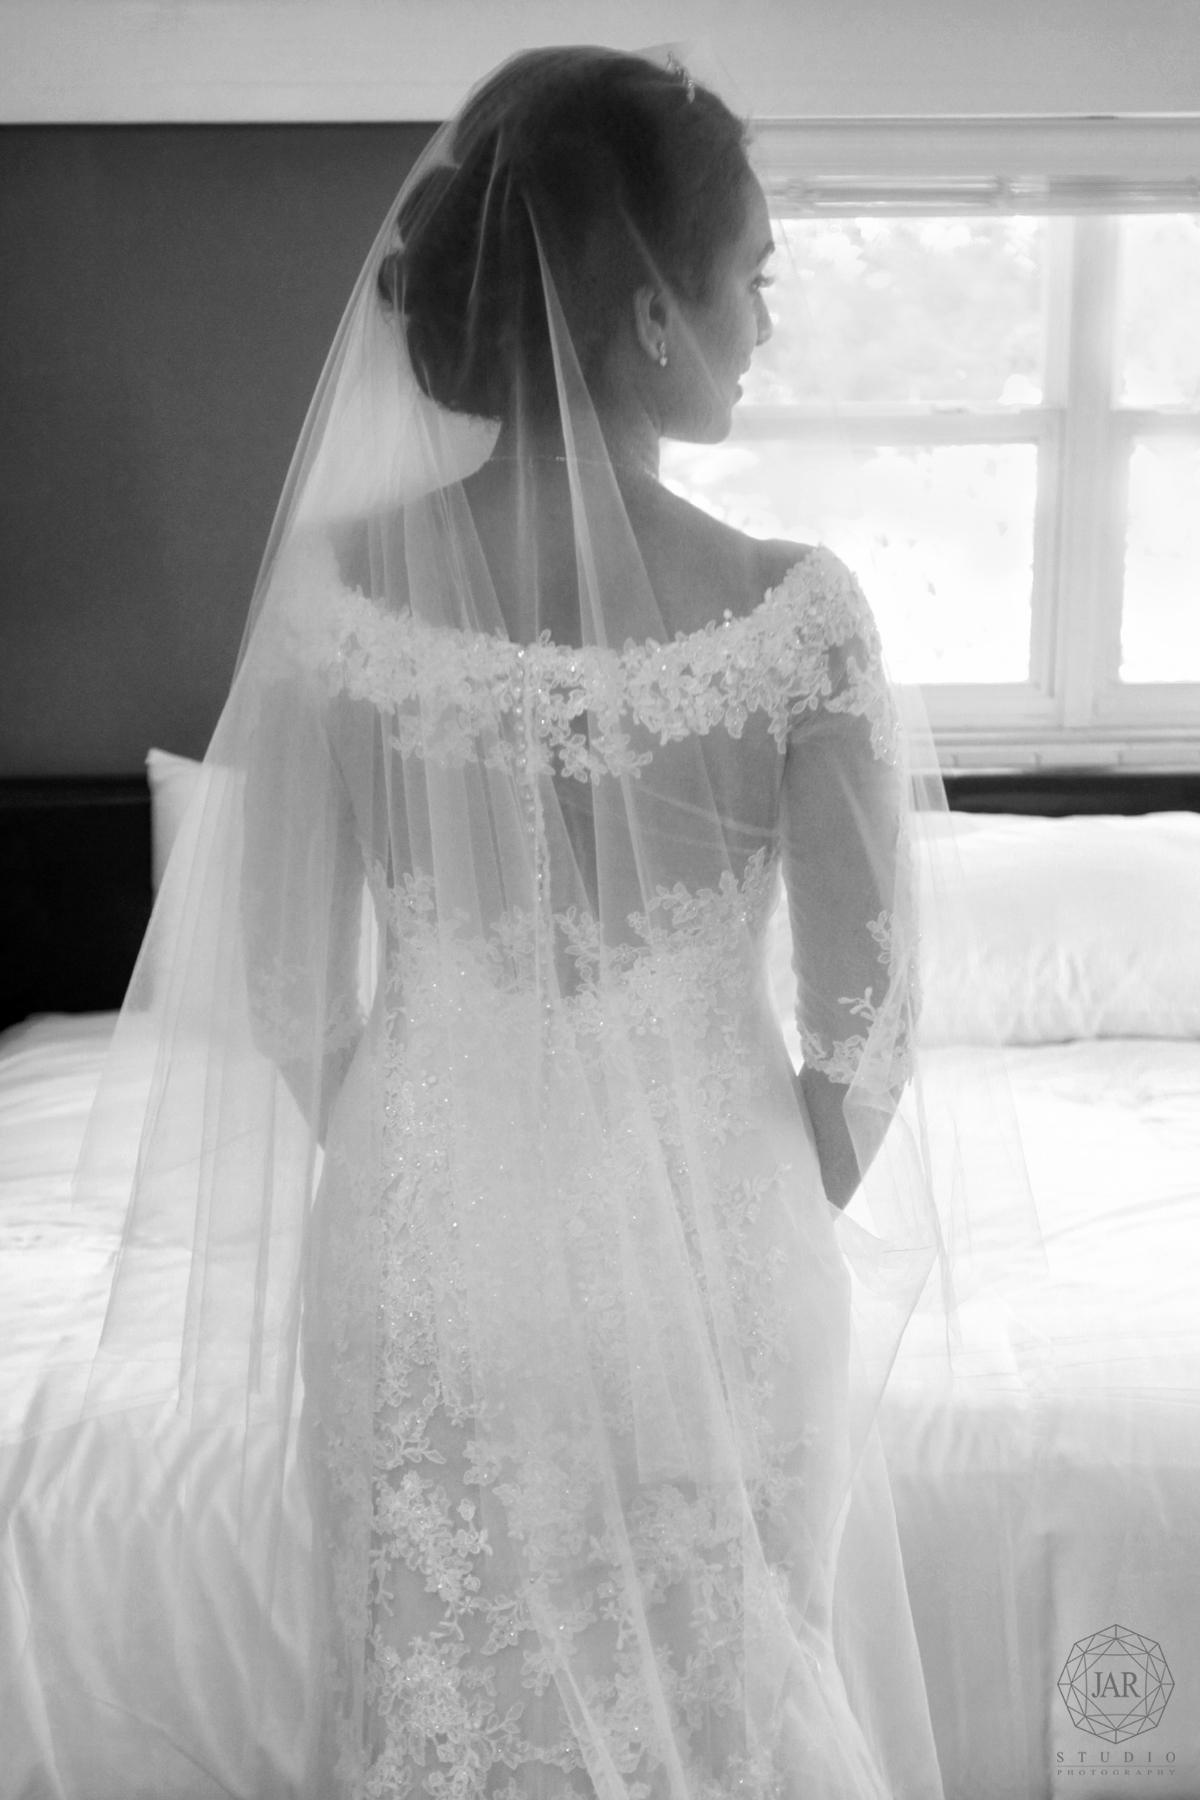 04-gorgeous-wedding-dress-trends-2017-jarstudio-photography.jpg